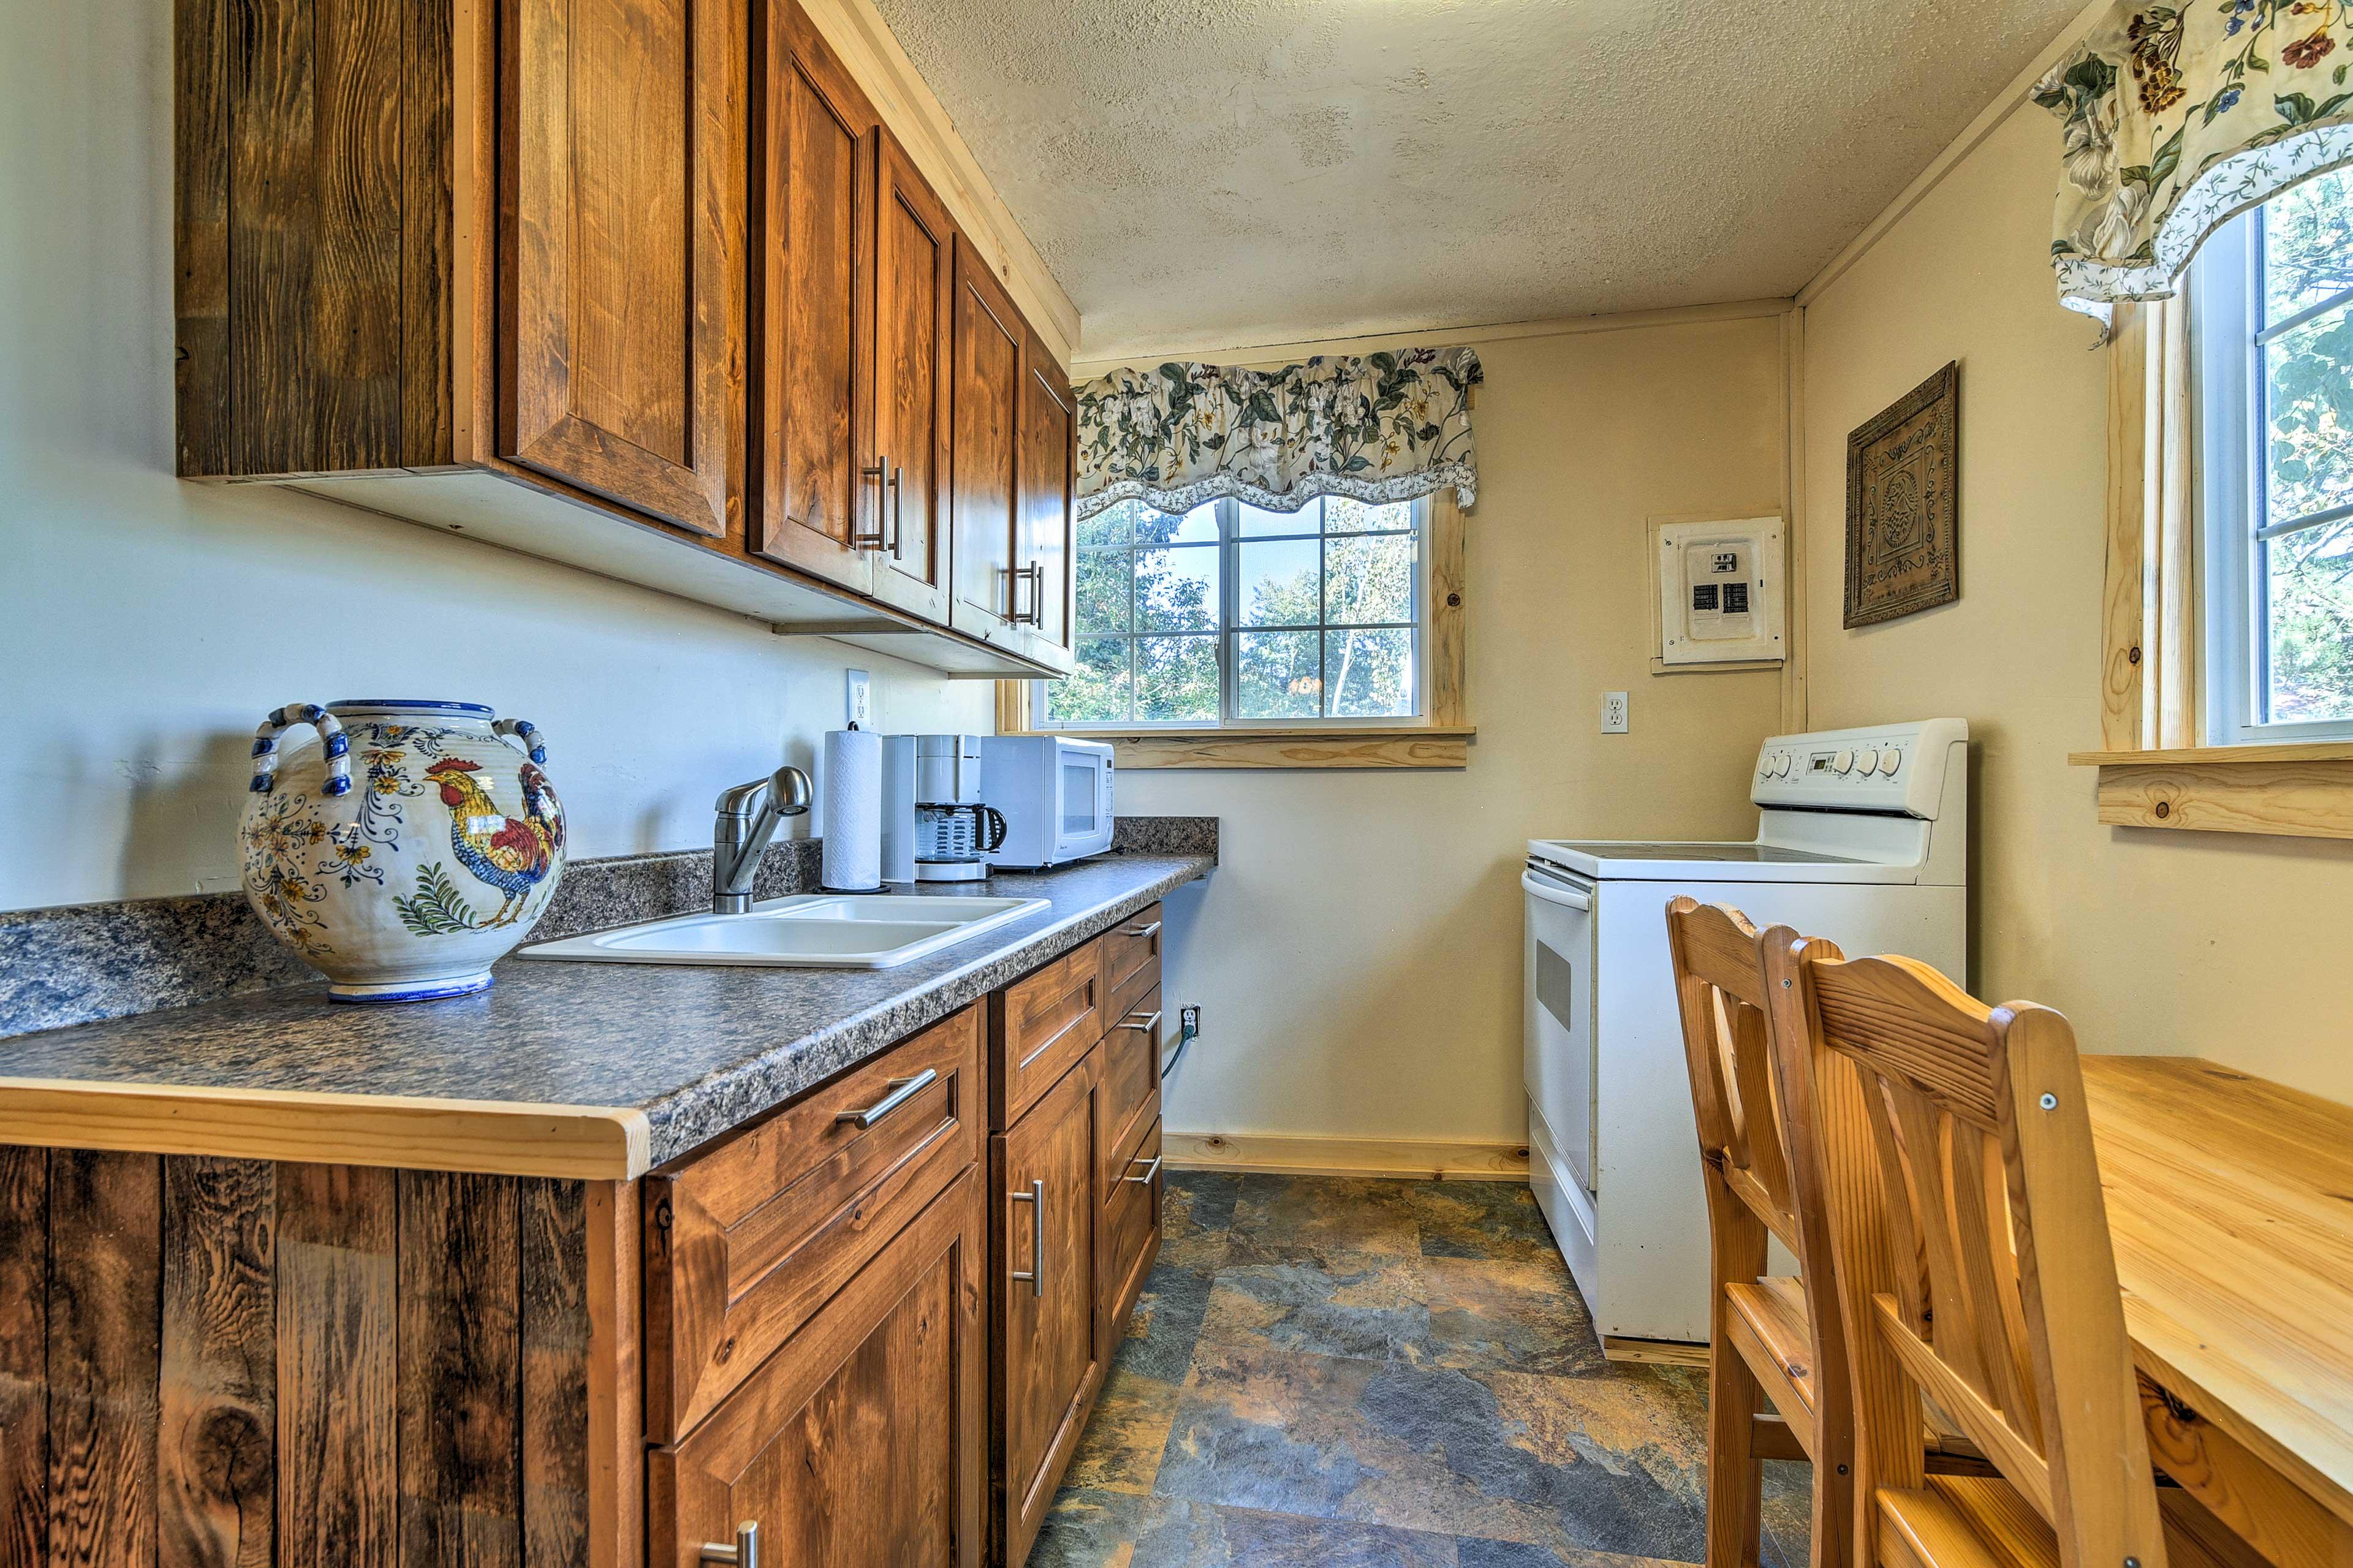 The kitchen gets plenty of natural light.